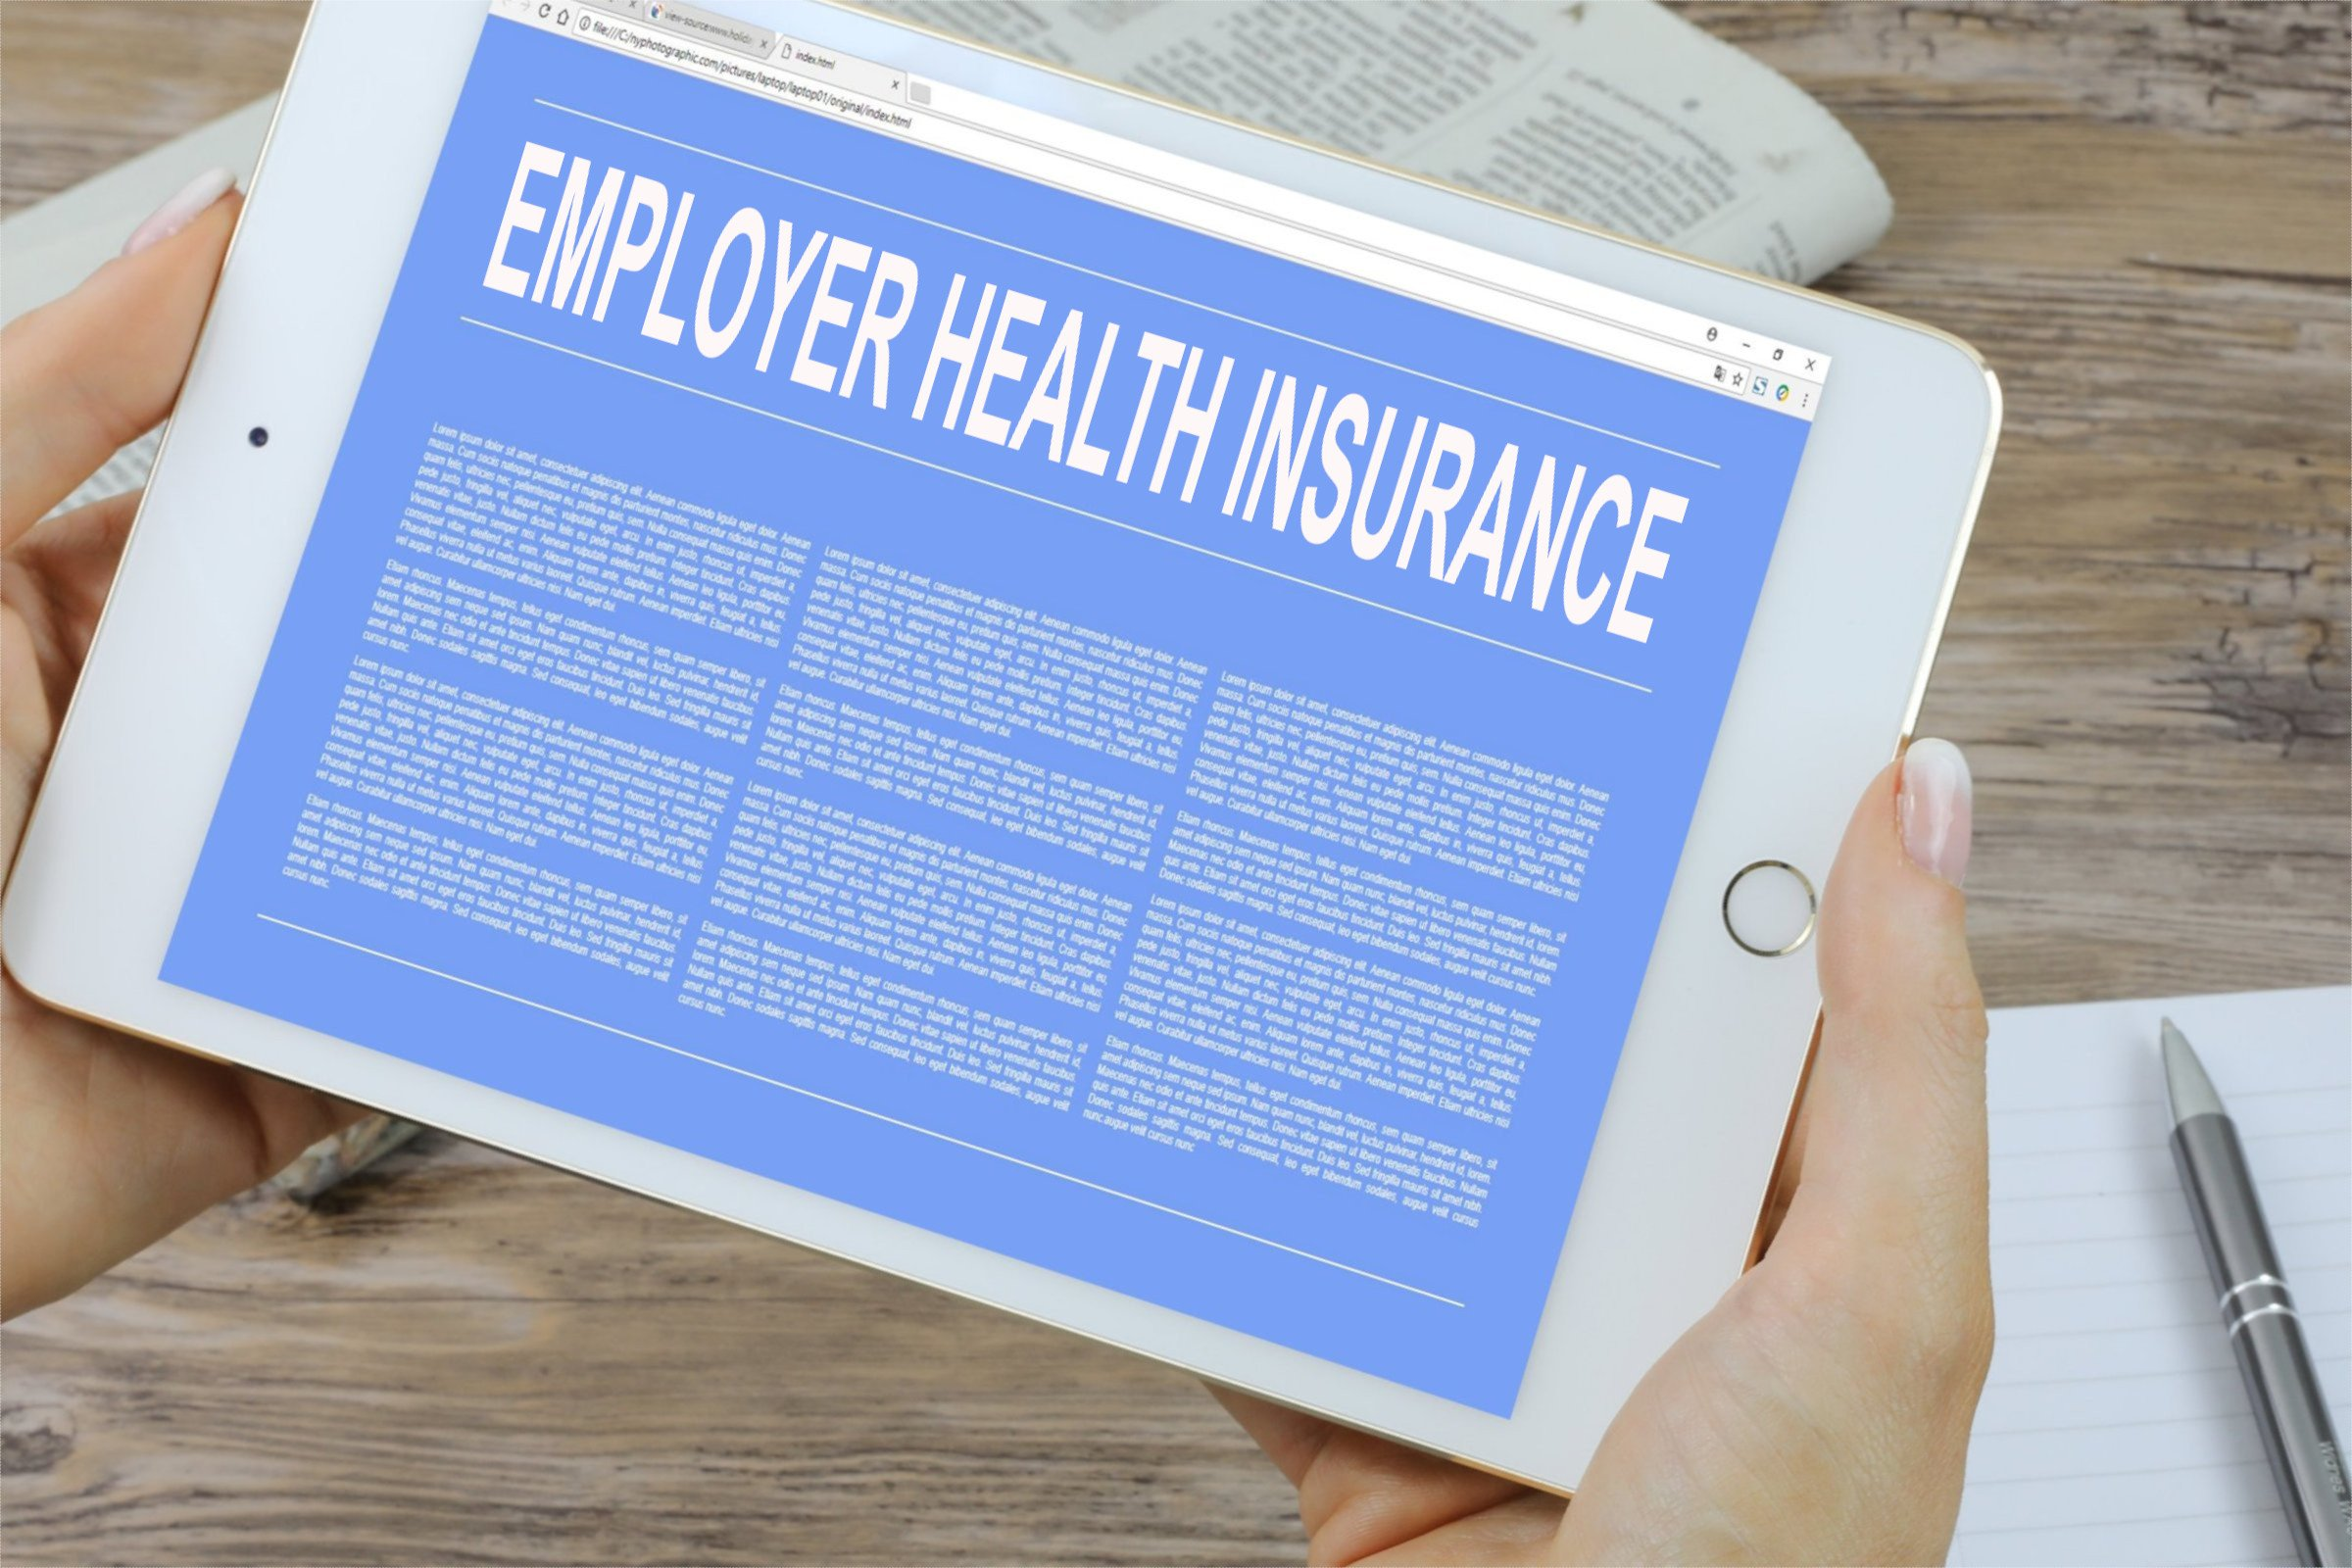 Employer Health Insurance